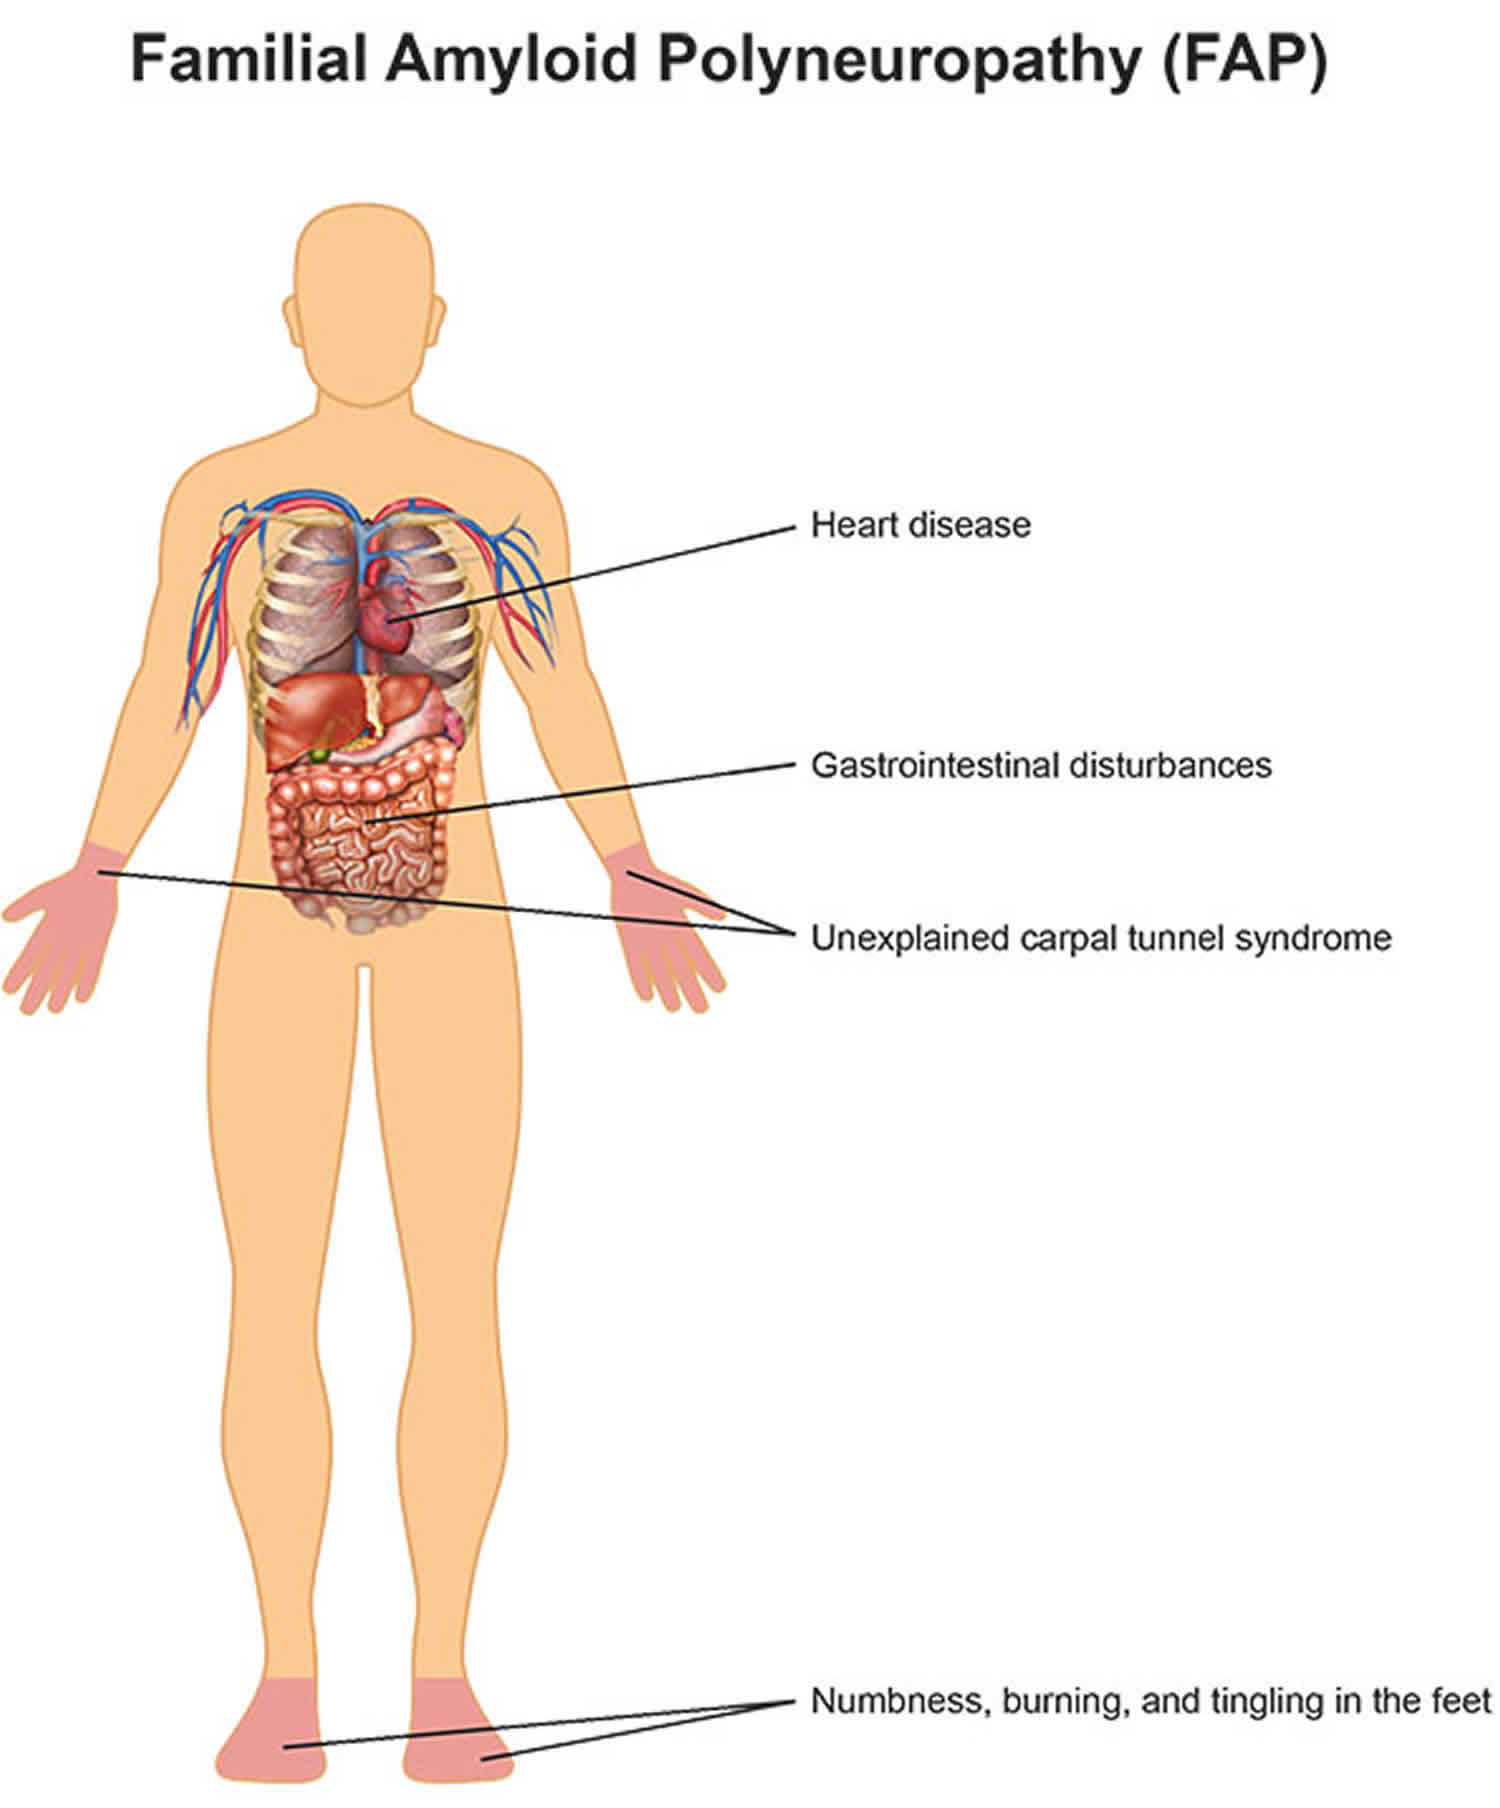 familial amyloid polyneuropathy